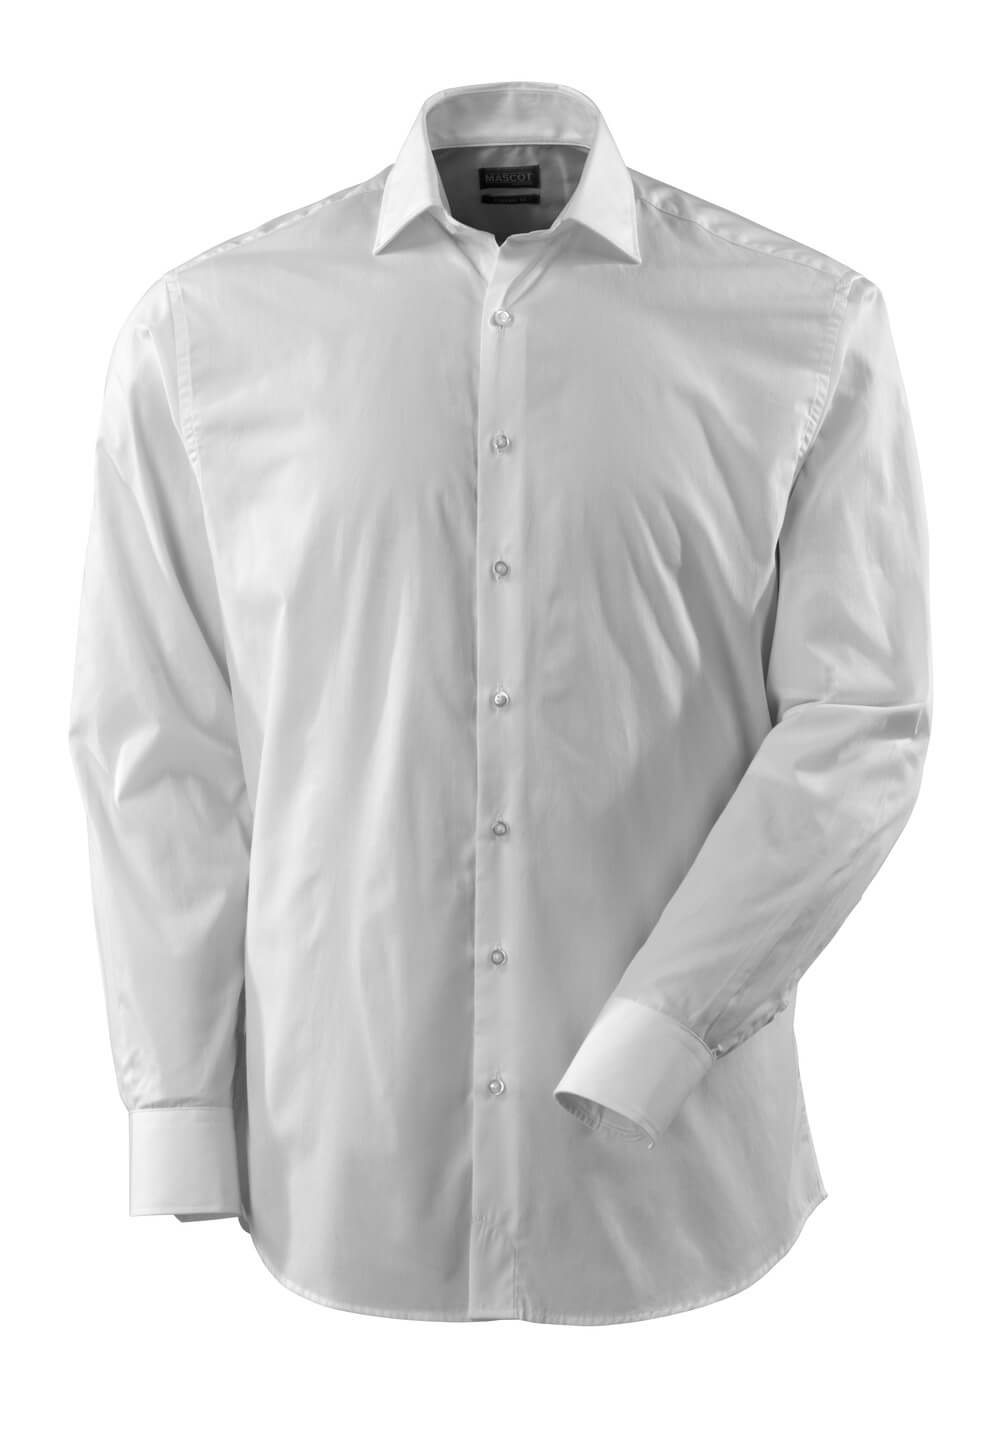 50631-984-06 Shirt - white